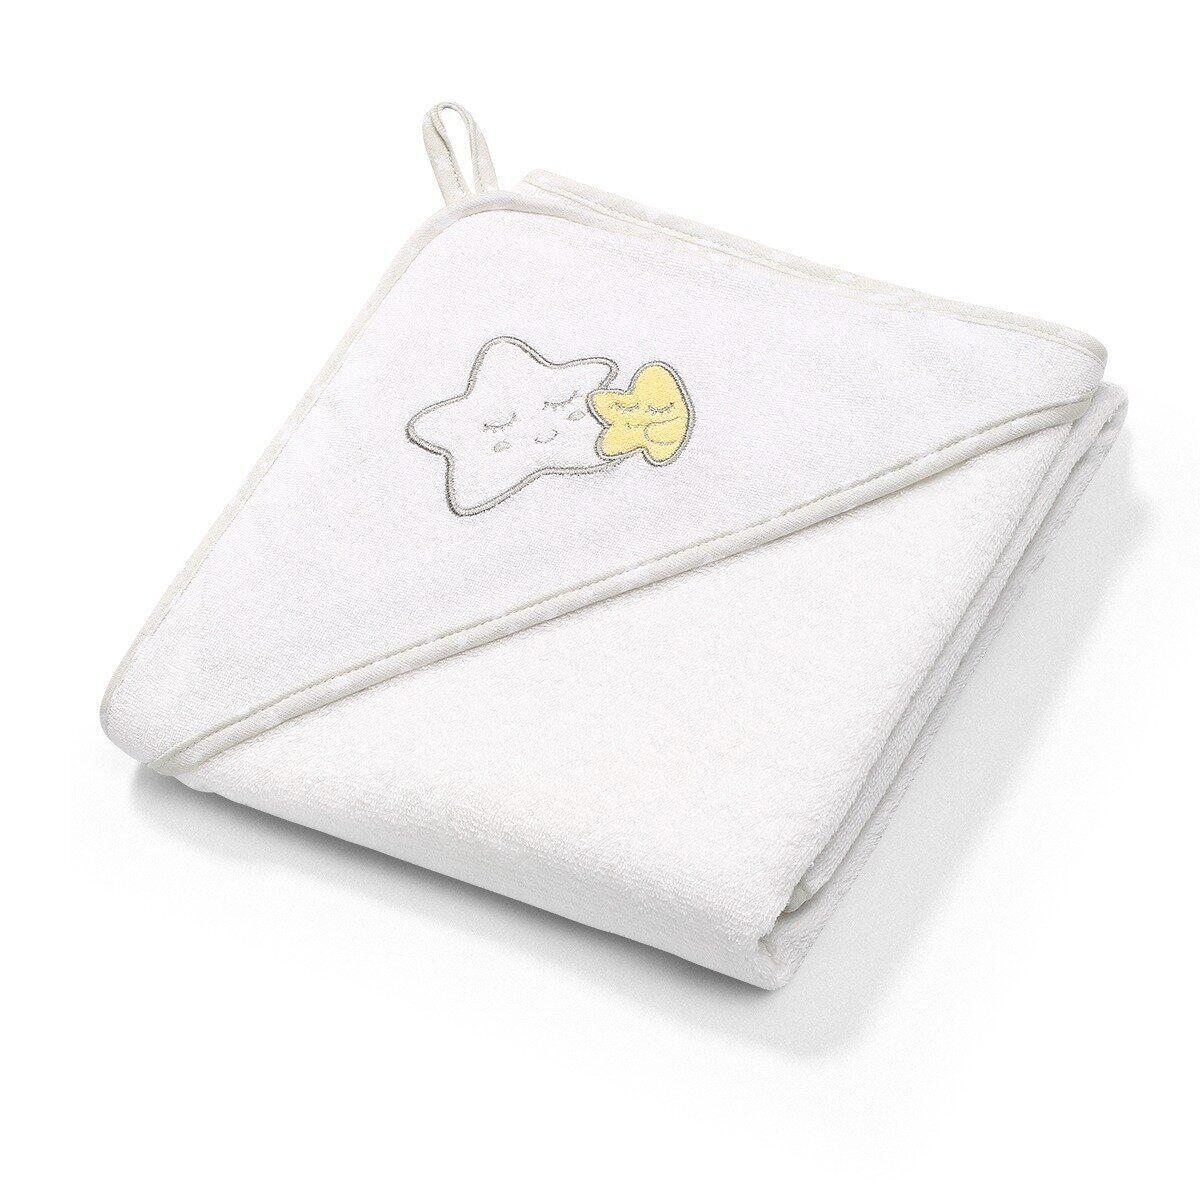 Полотенце махровое с капюшоном BabyOno 100x100 см Звездочки